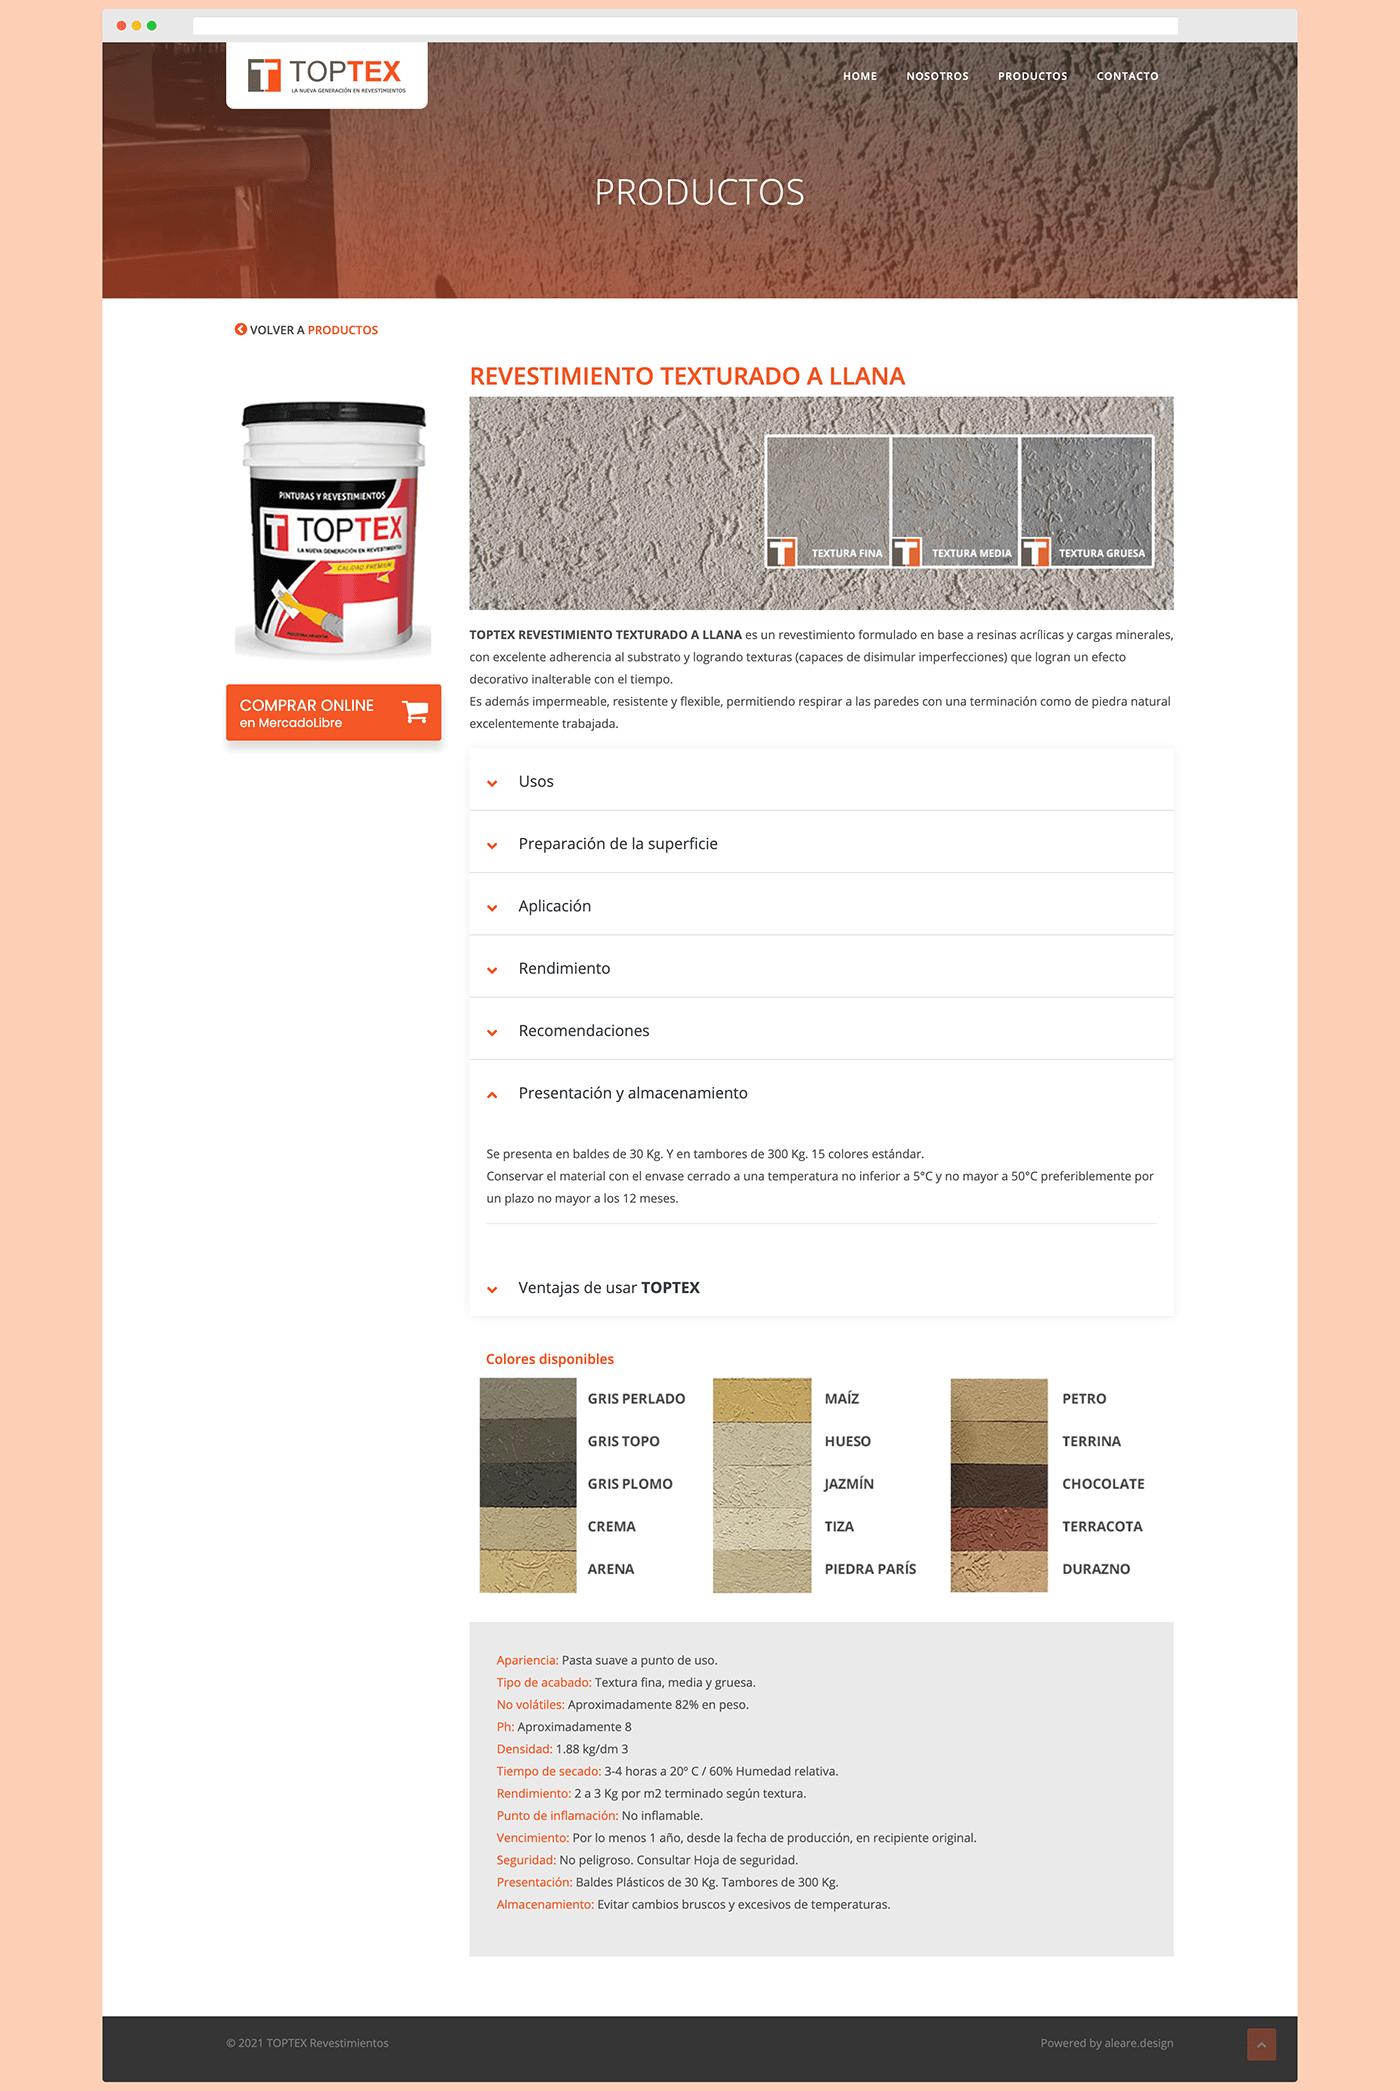 TOPTEX Revestimientos - Sitio web institucional - Productos